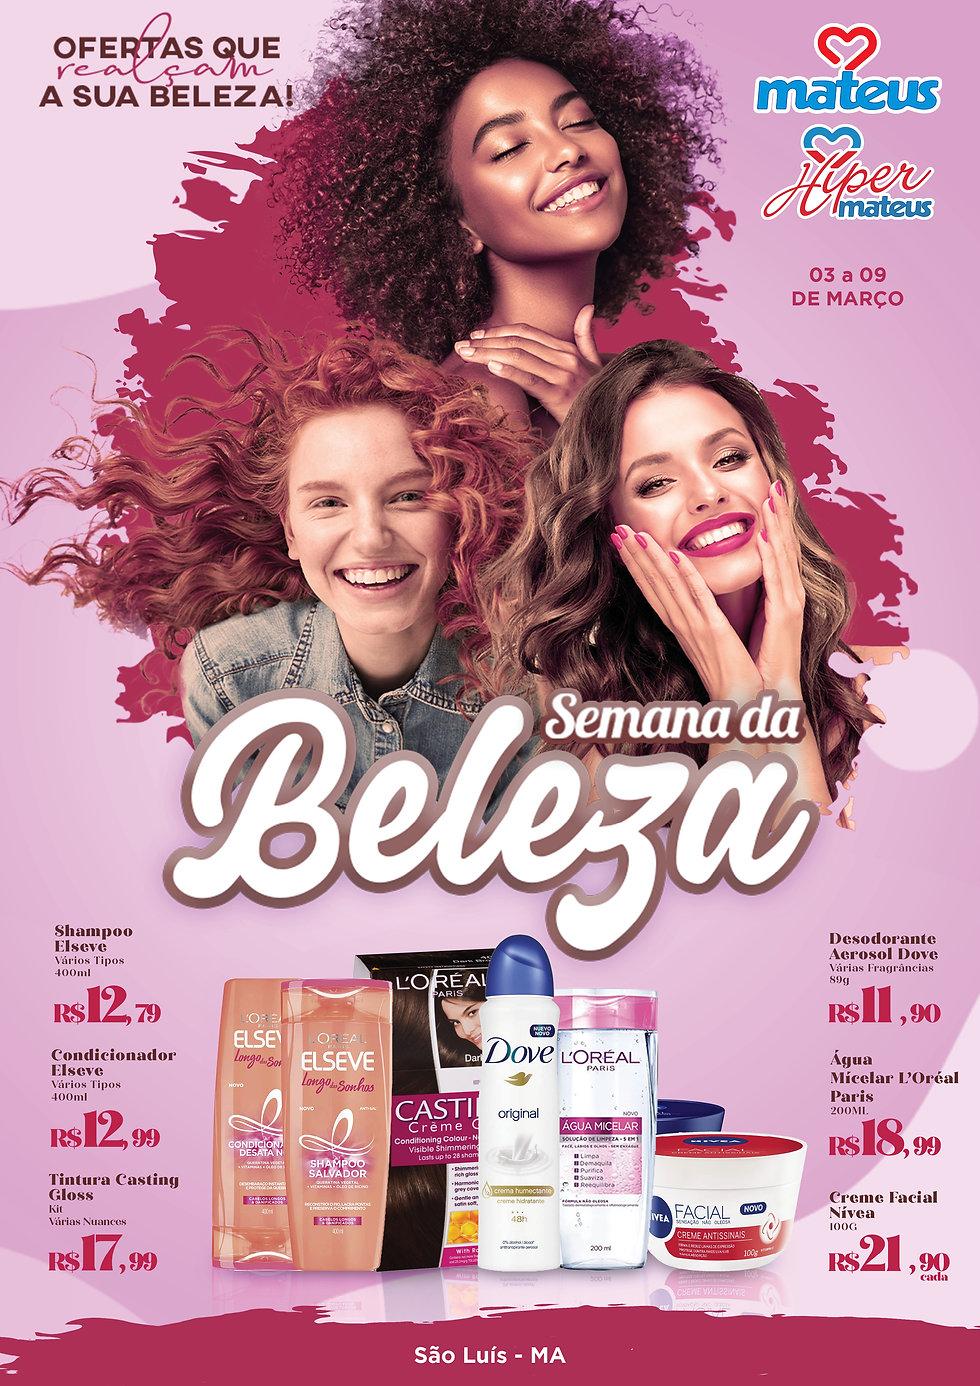 REVISTA_SEMANA-DA-BELEZA_SLZ.jpg